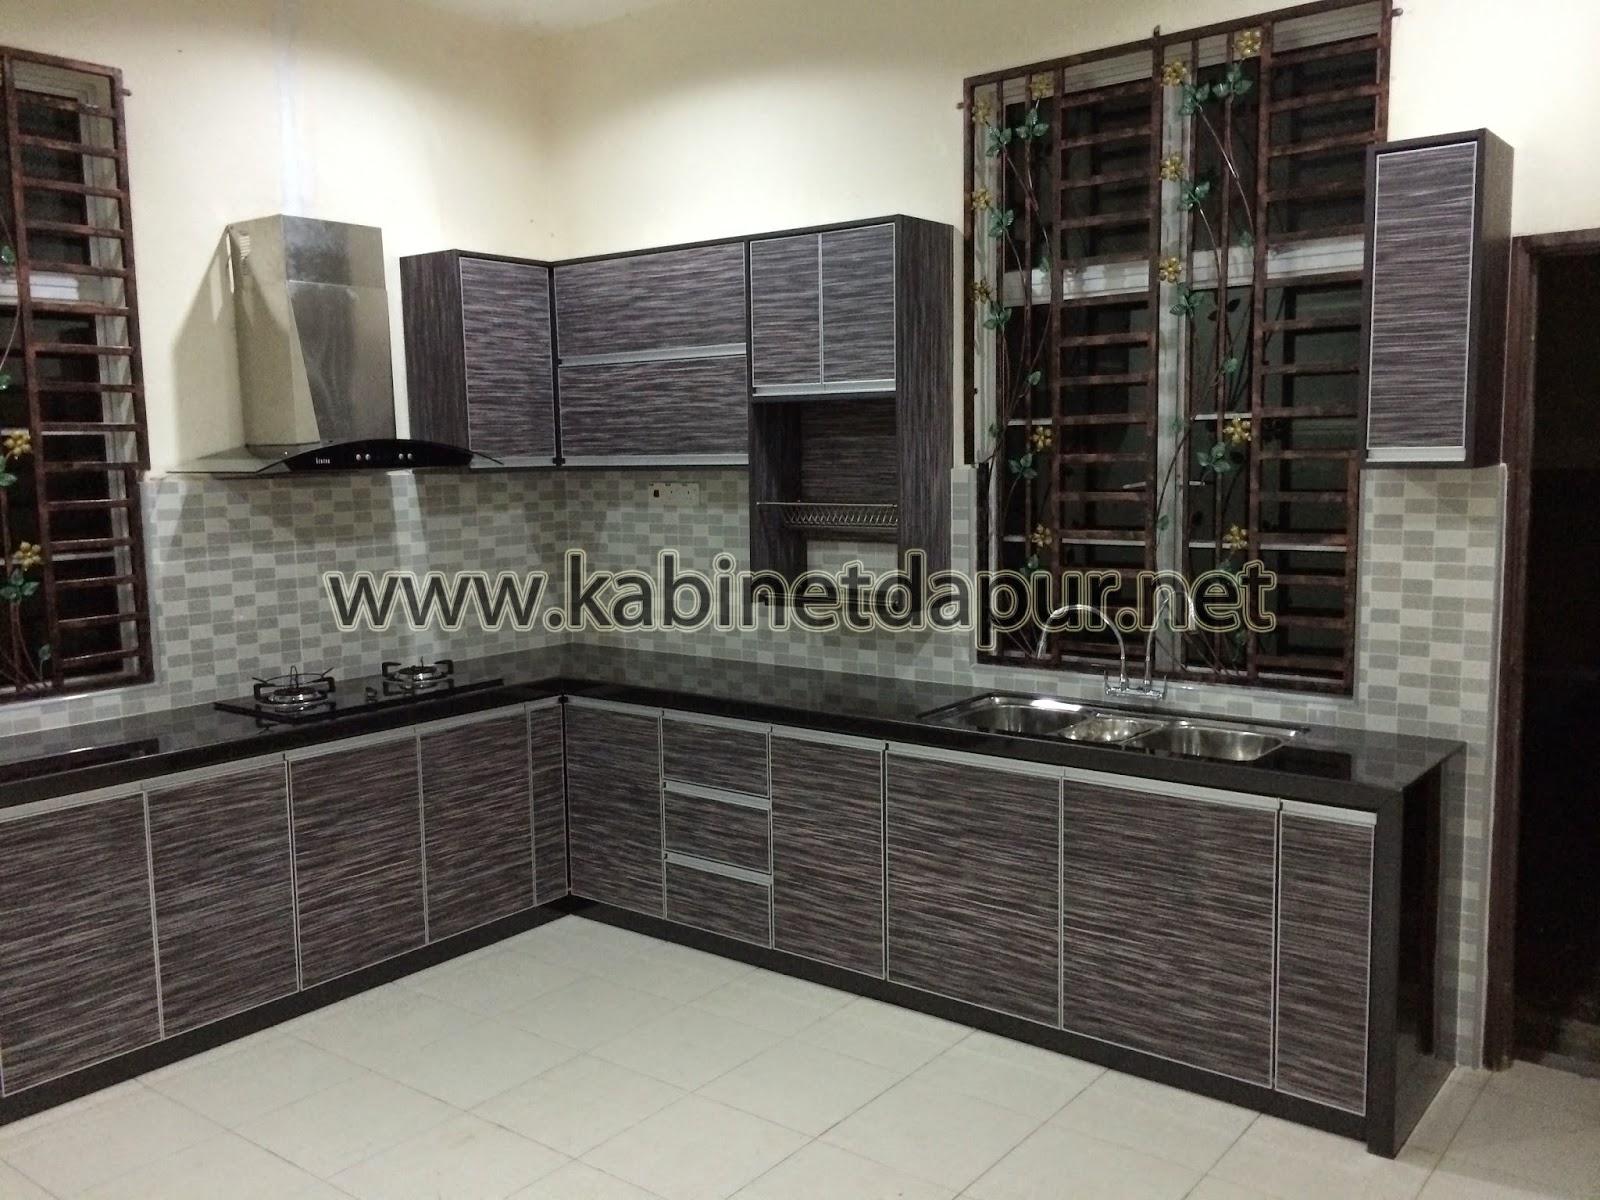 Ini Projek Kabinet Dapur Terbaru Kami Bln Ogos 2017 Tuan Rumah Memilih Table Top Konkrit Kemasan Mozek Manakala Pintu Dari Material Melamine